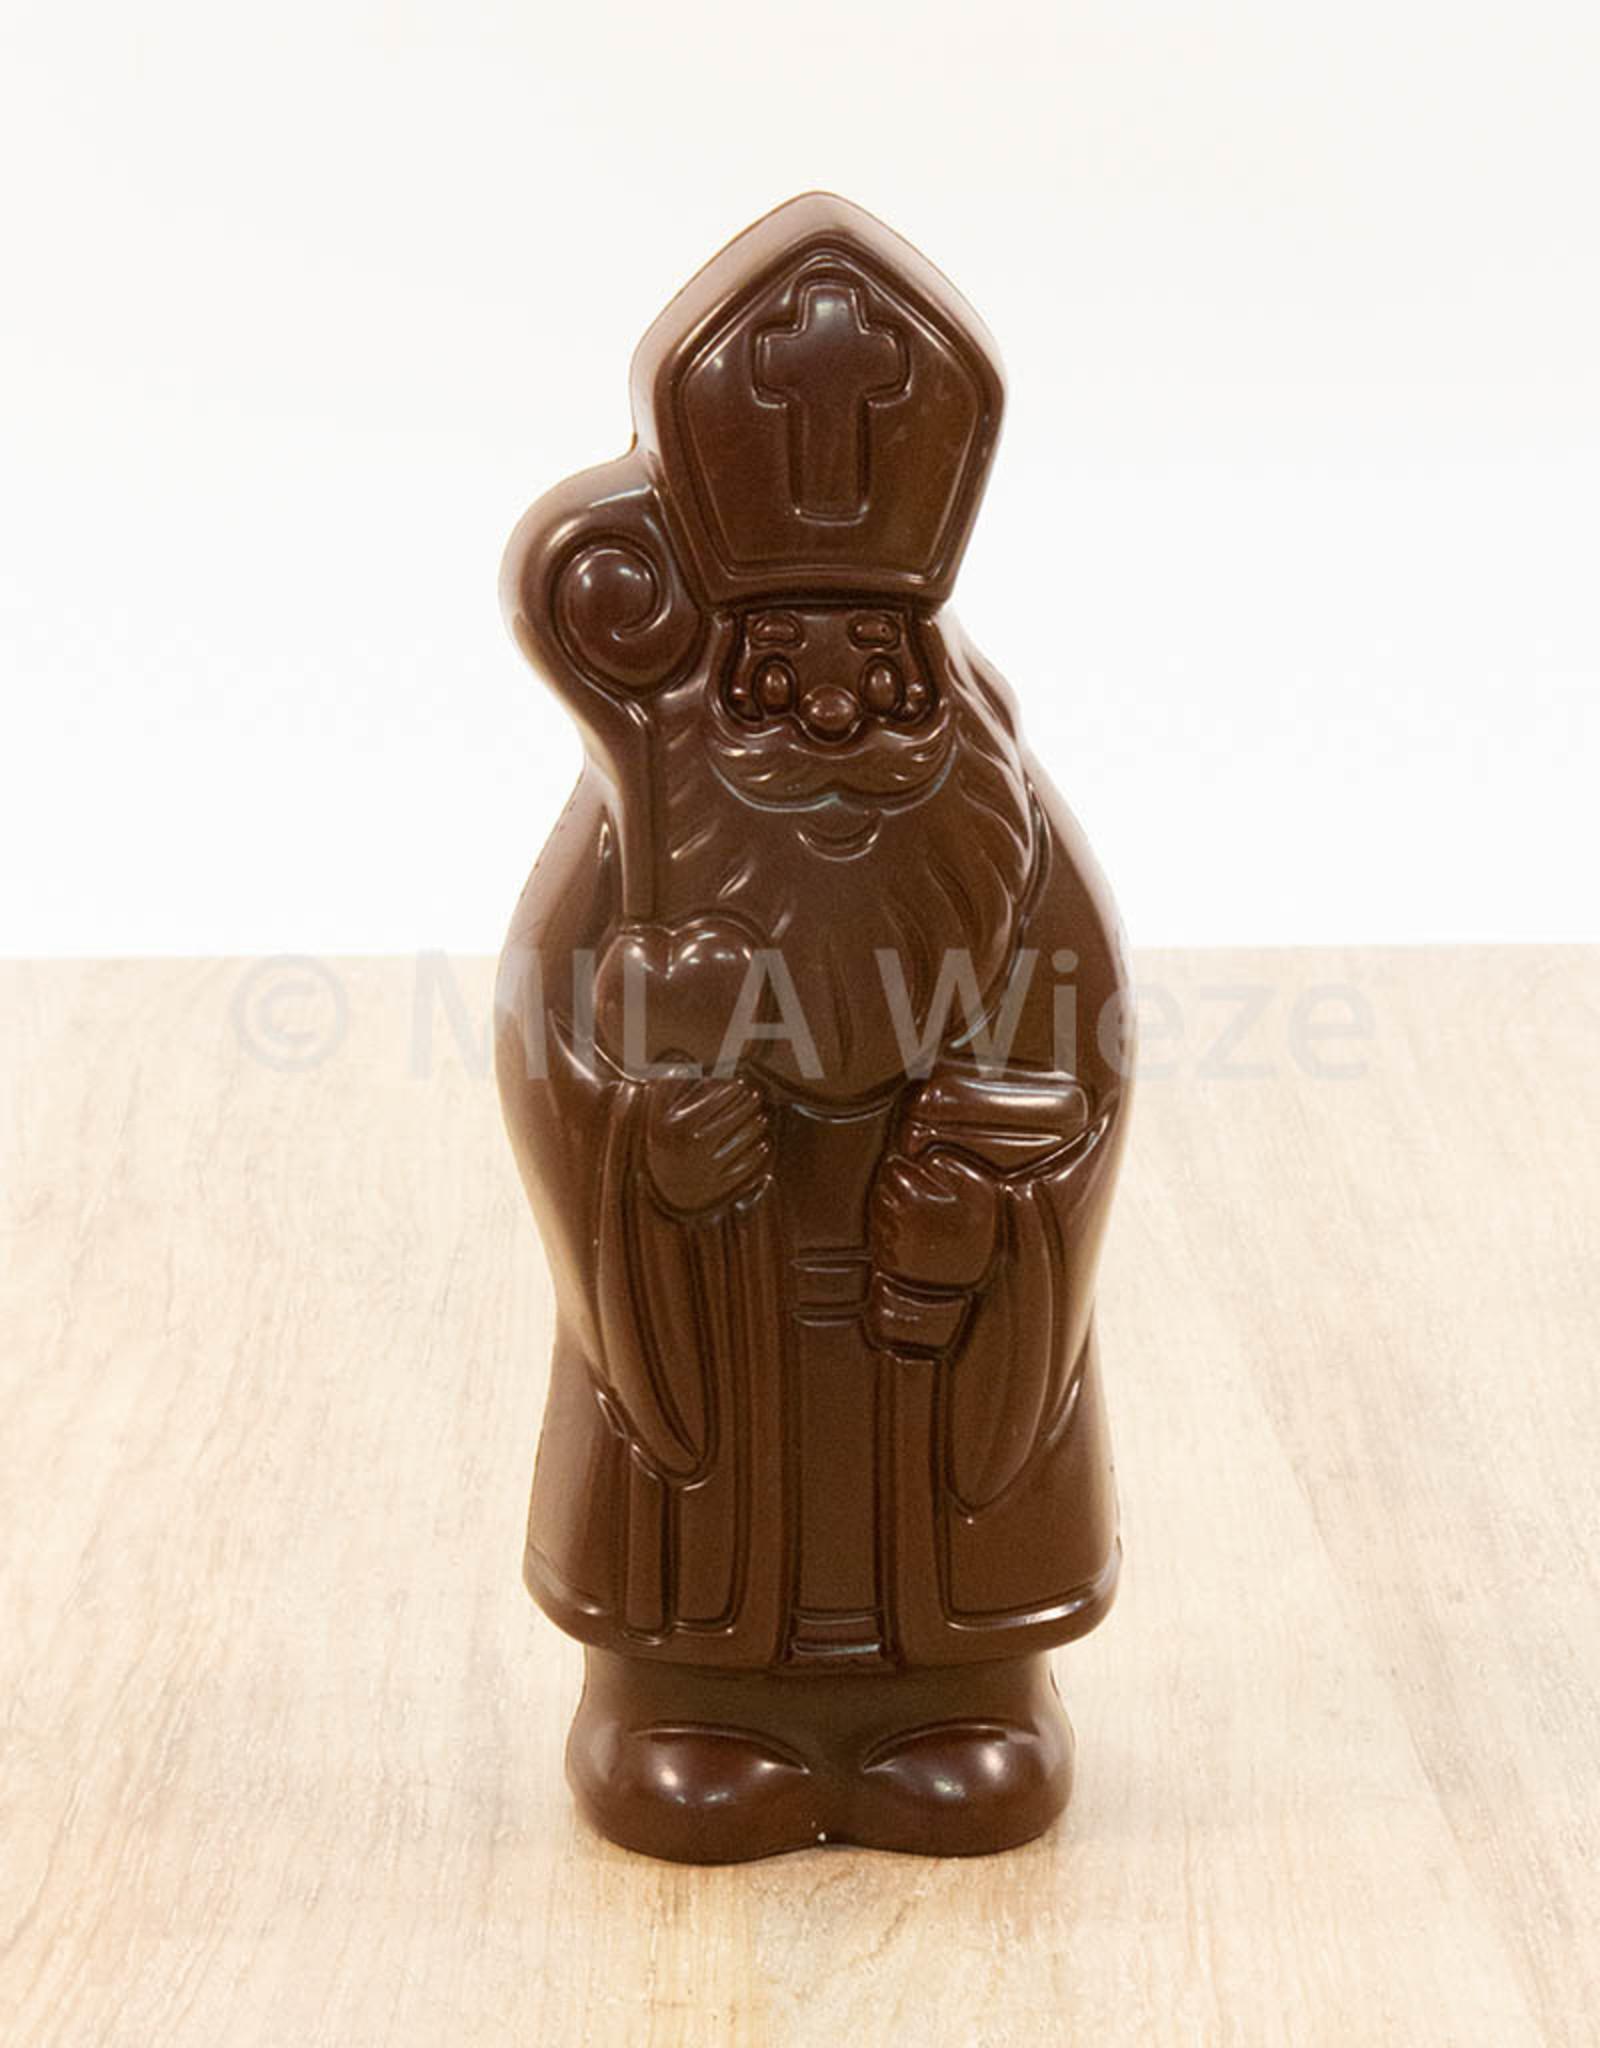 Lachende sint - 50 gr - 12 cm -melk-, witte en fondant chocolade